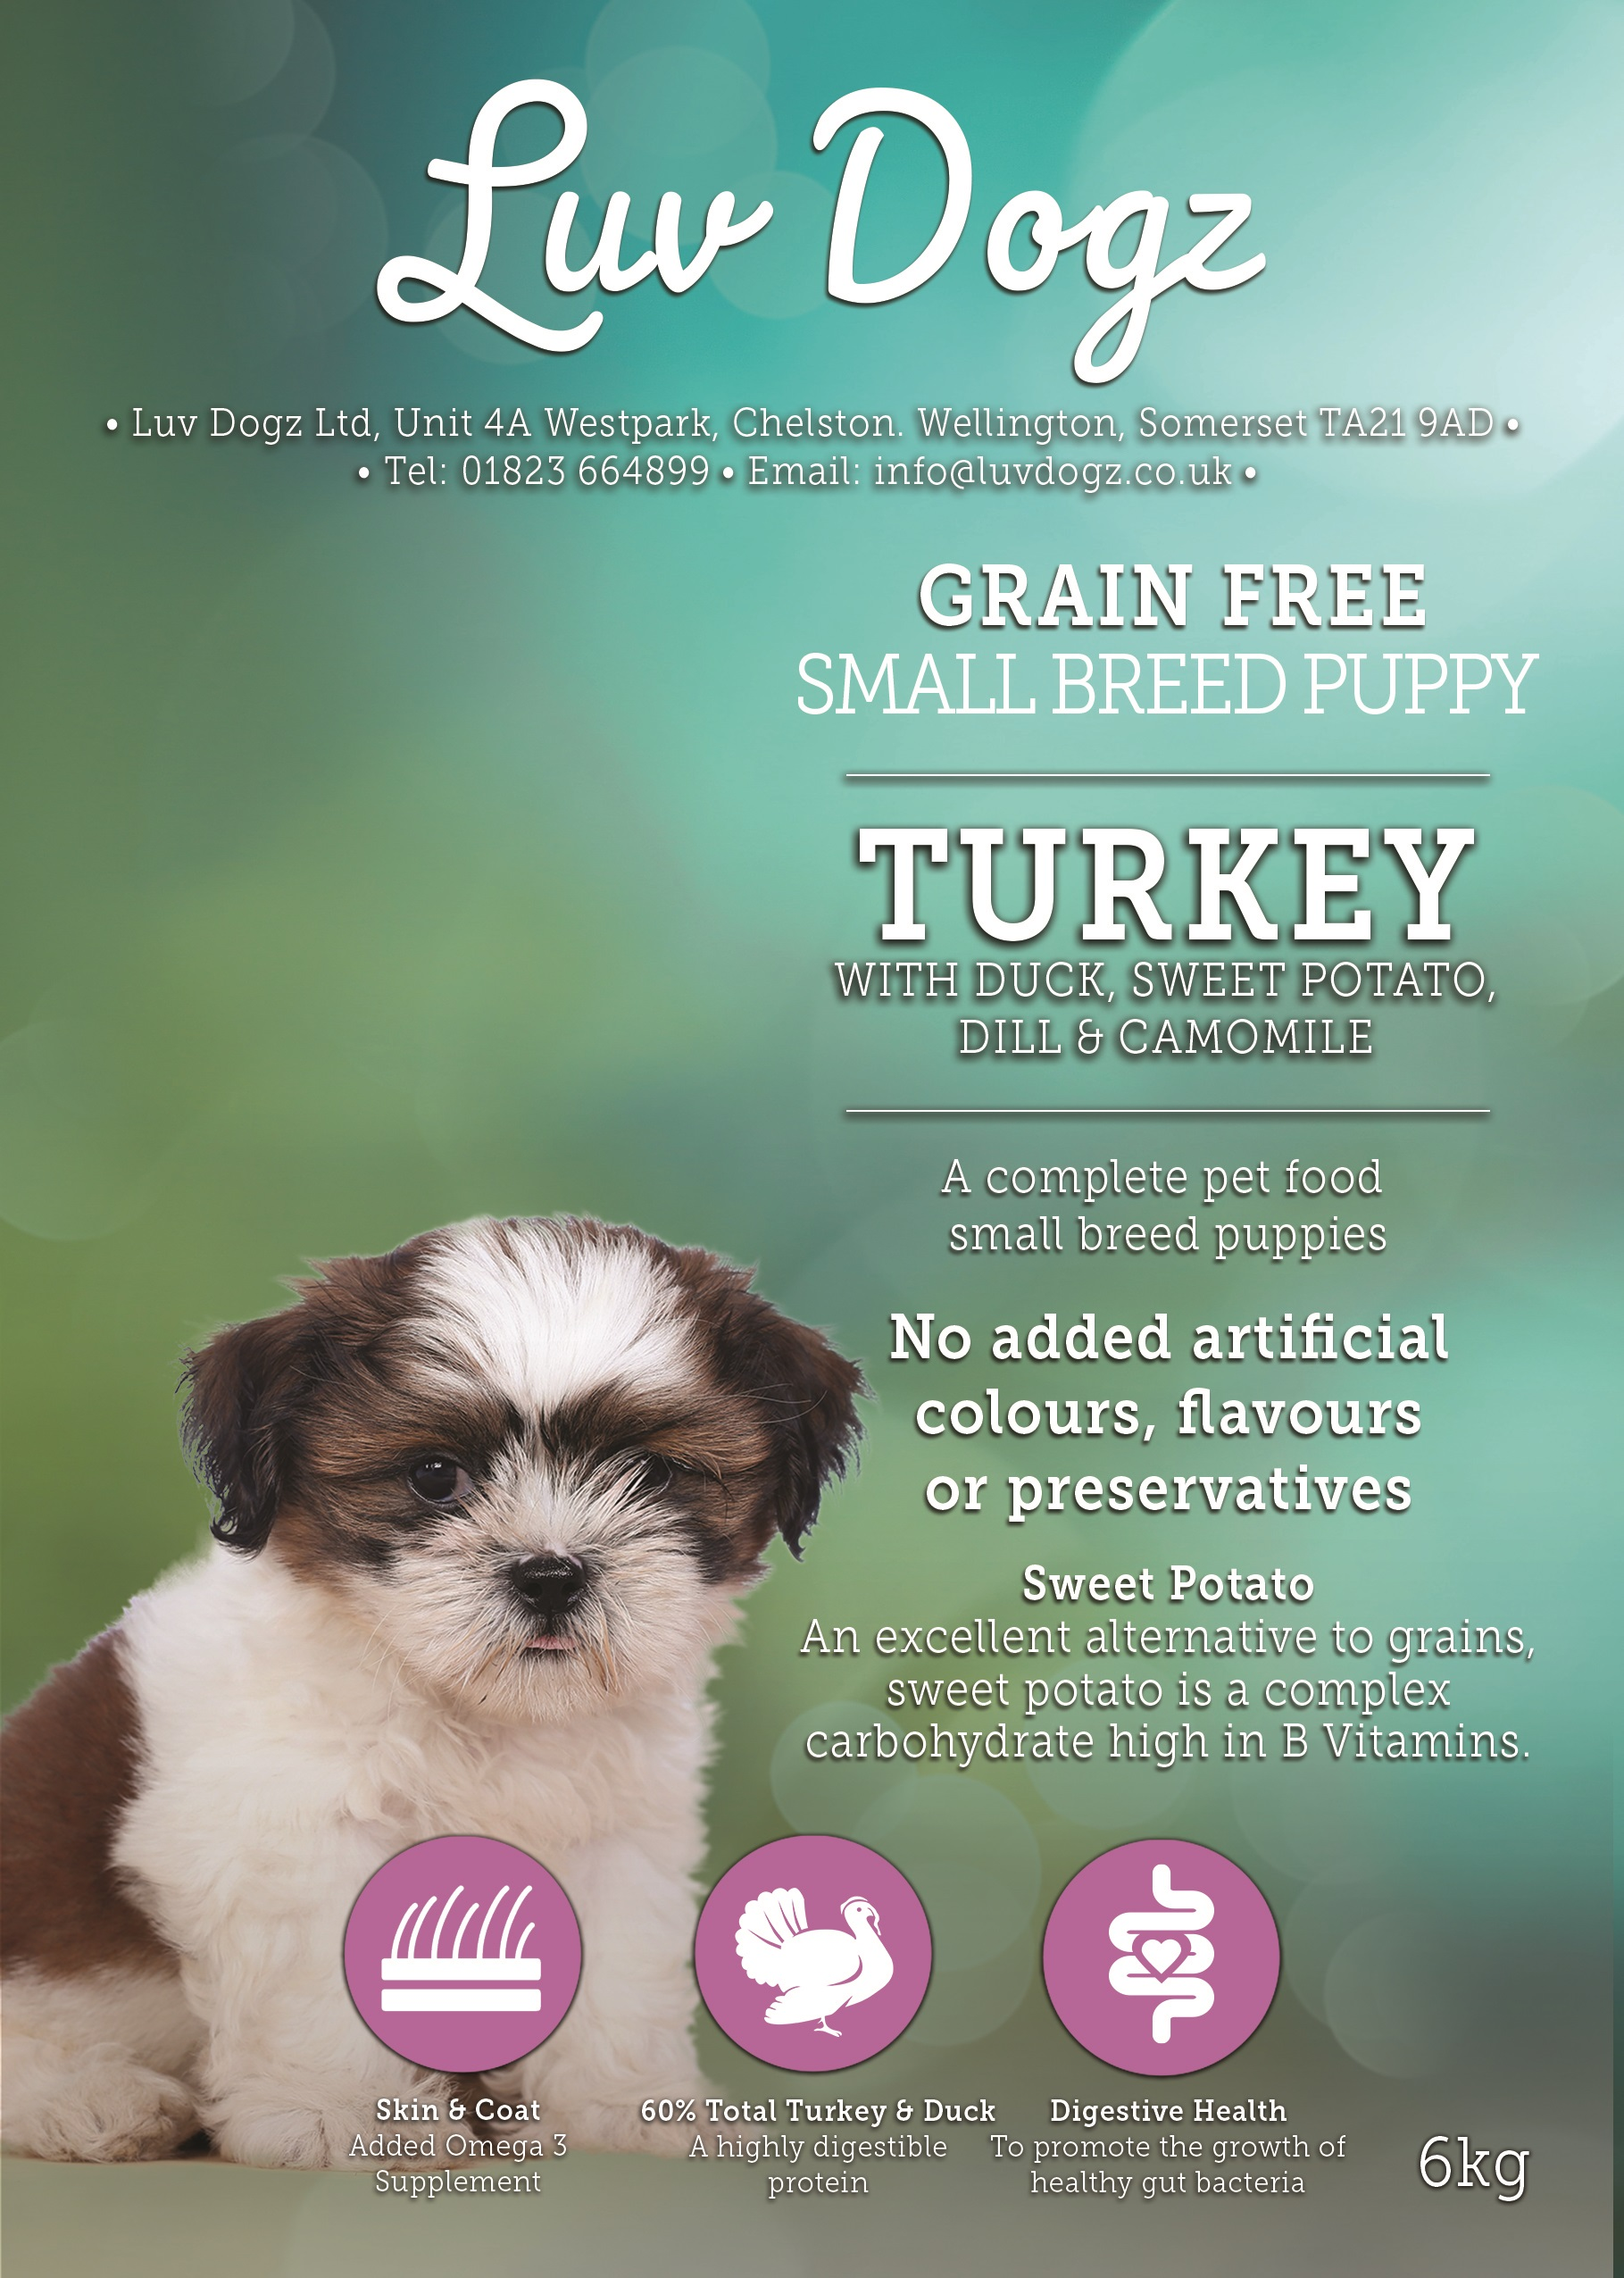 Grain Free Small Breed Puppy Turkey With Duck & sweet Potato